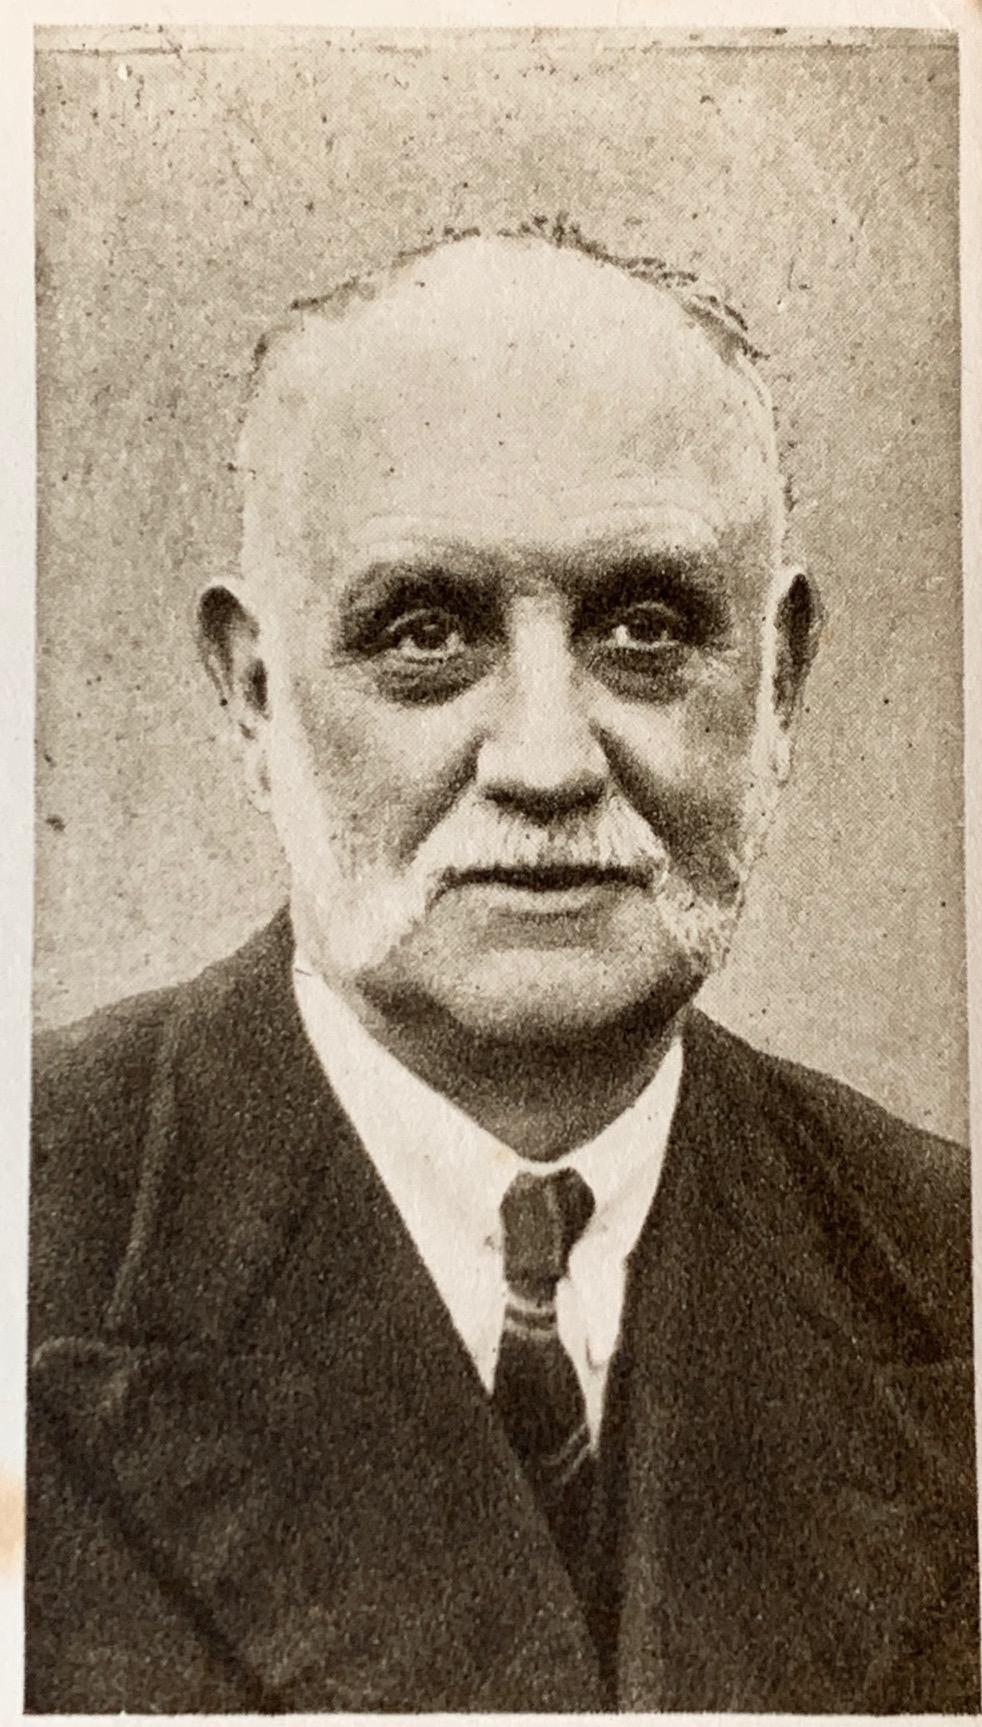 George Lansbury